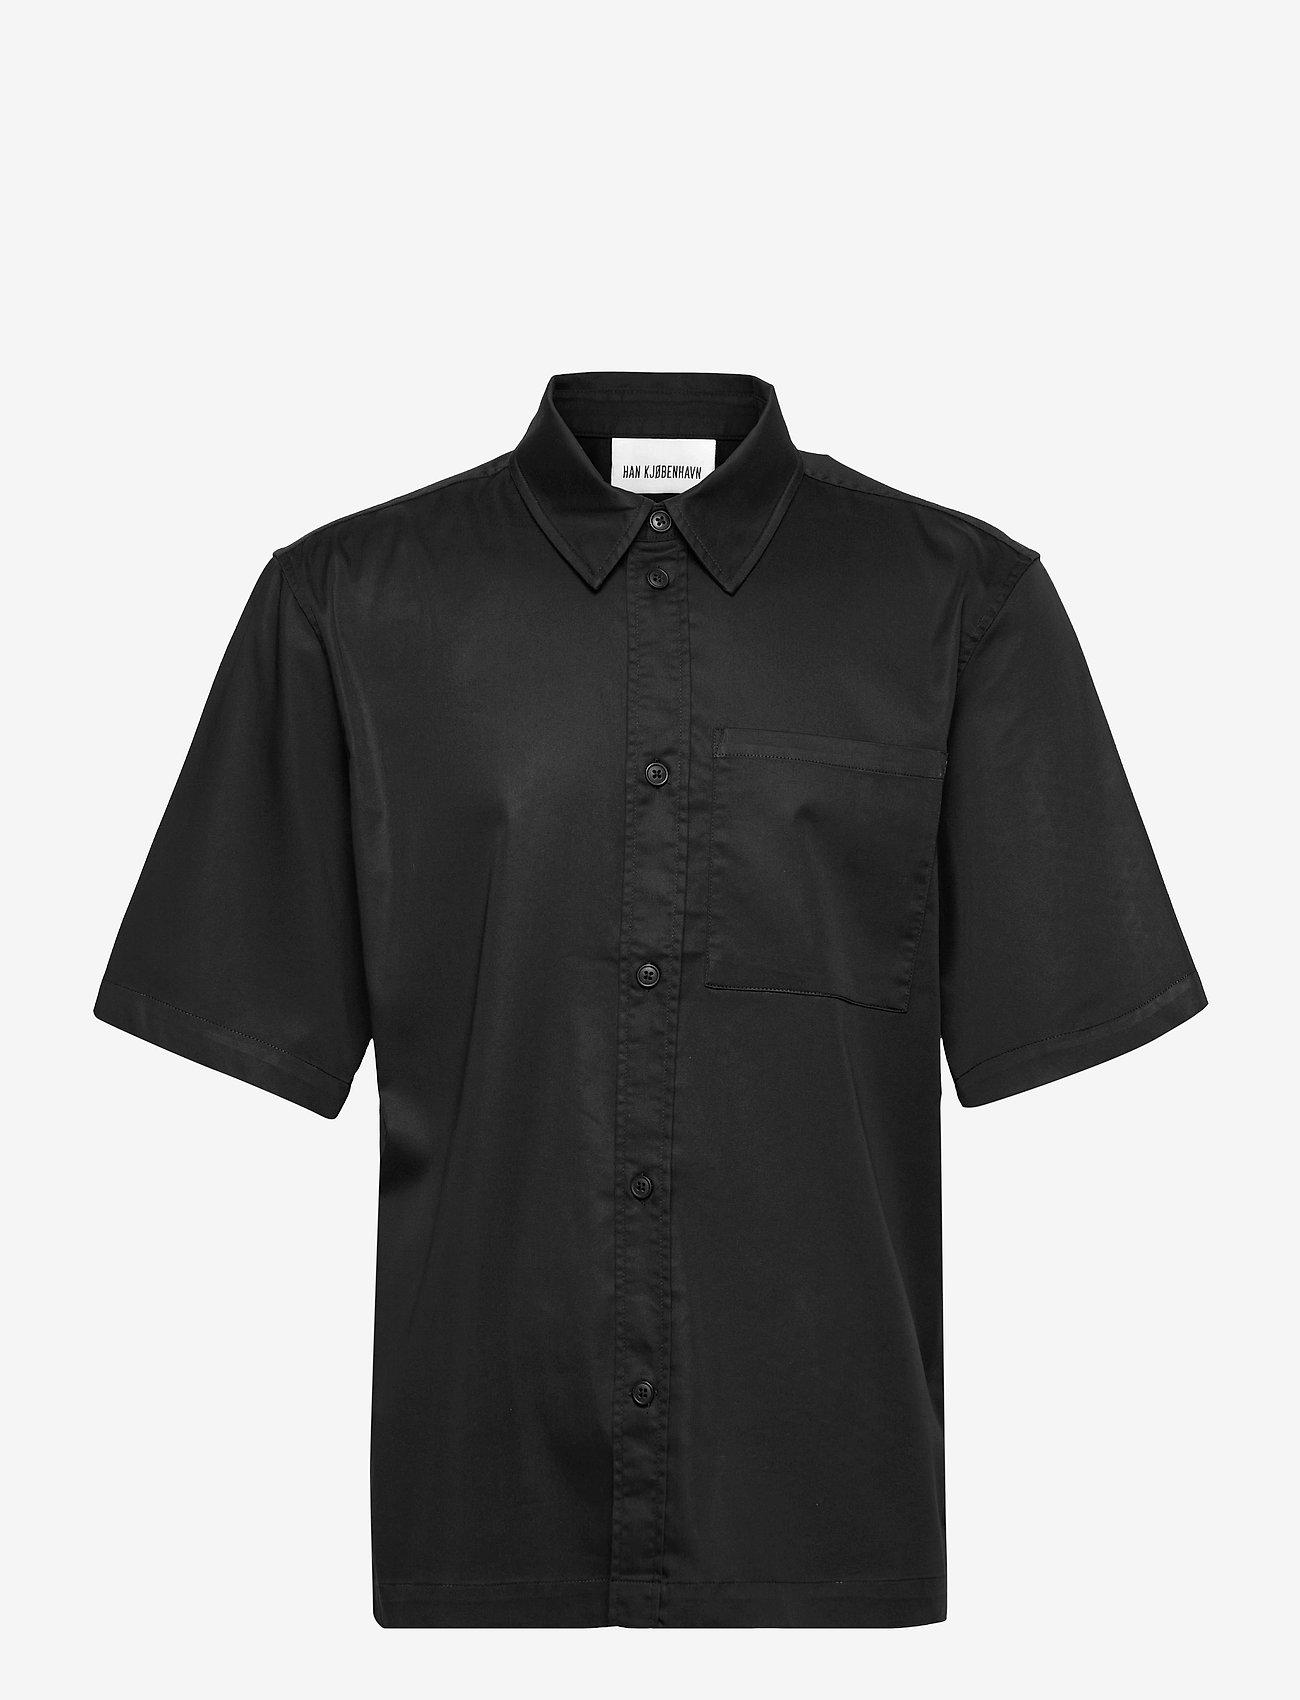 HAN Kjøbenhavn - Boxy Shirt SS - oxford overhemden - black - 1